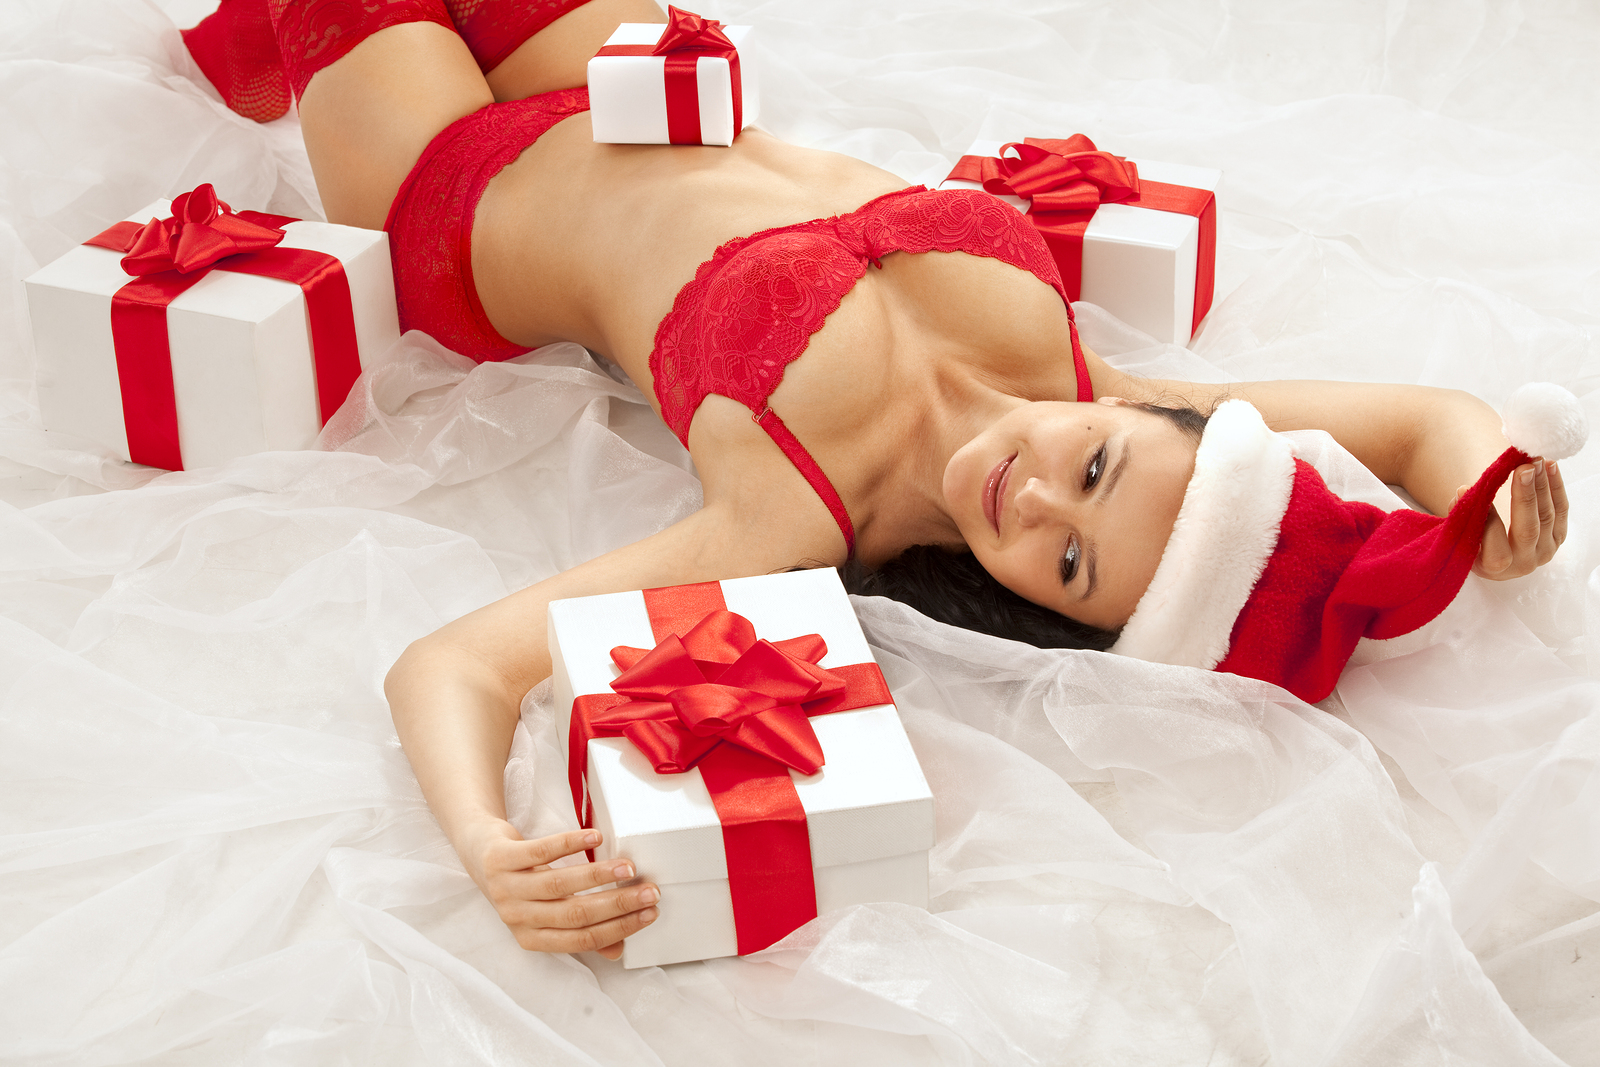 Ideje za sexy božićne poklone